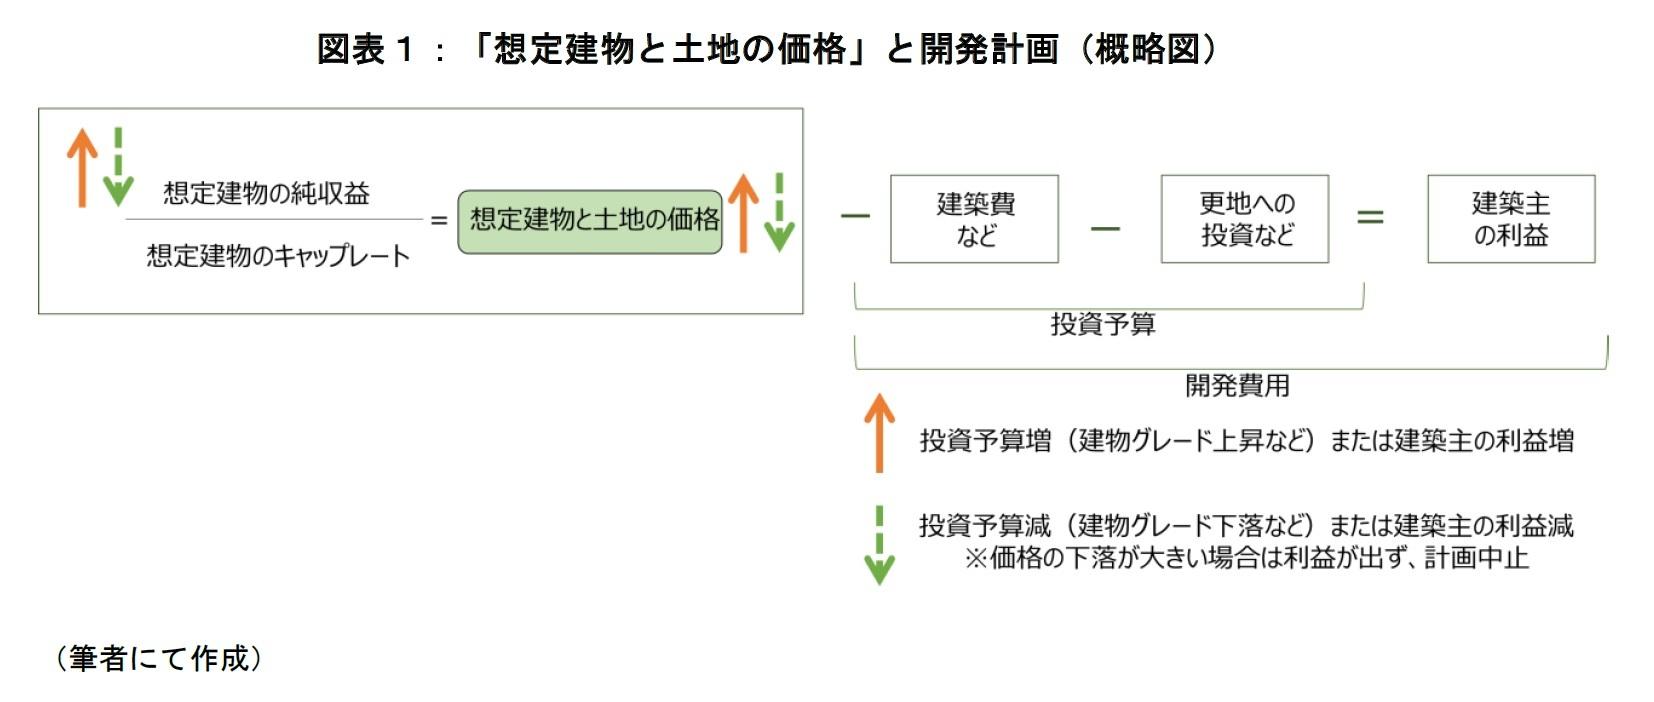 図表1:「想定建物と土地の価格」と開発計画(概略図)